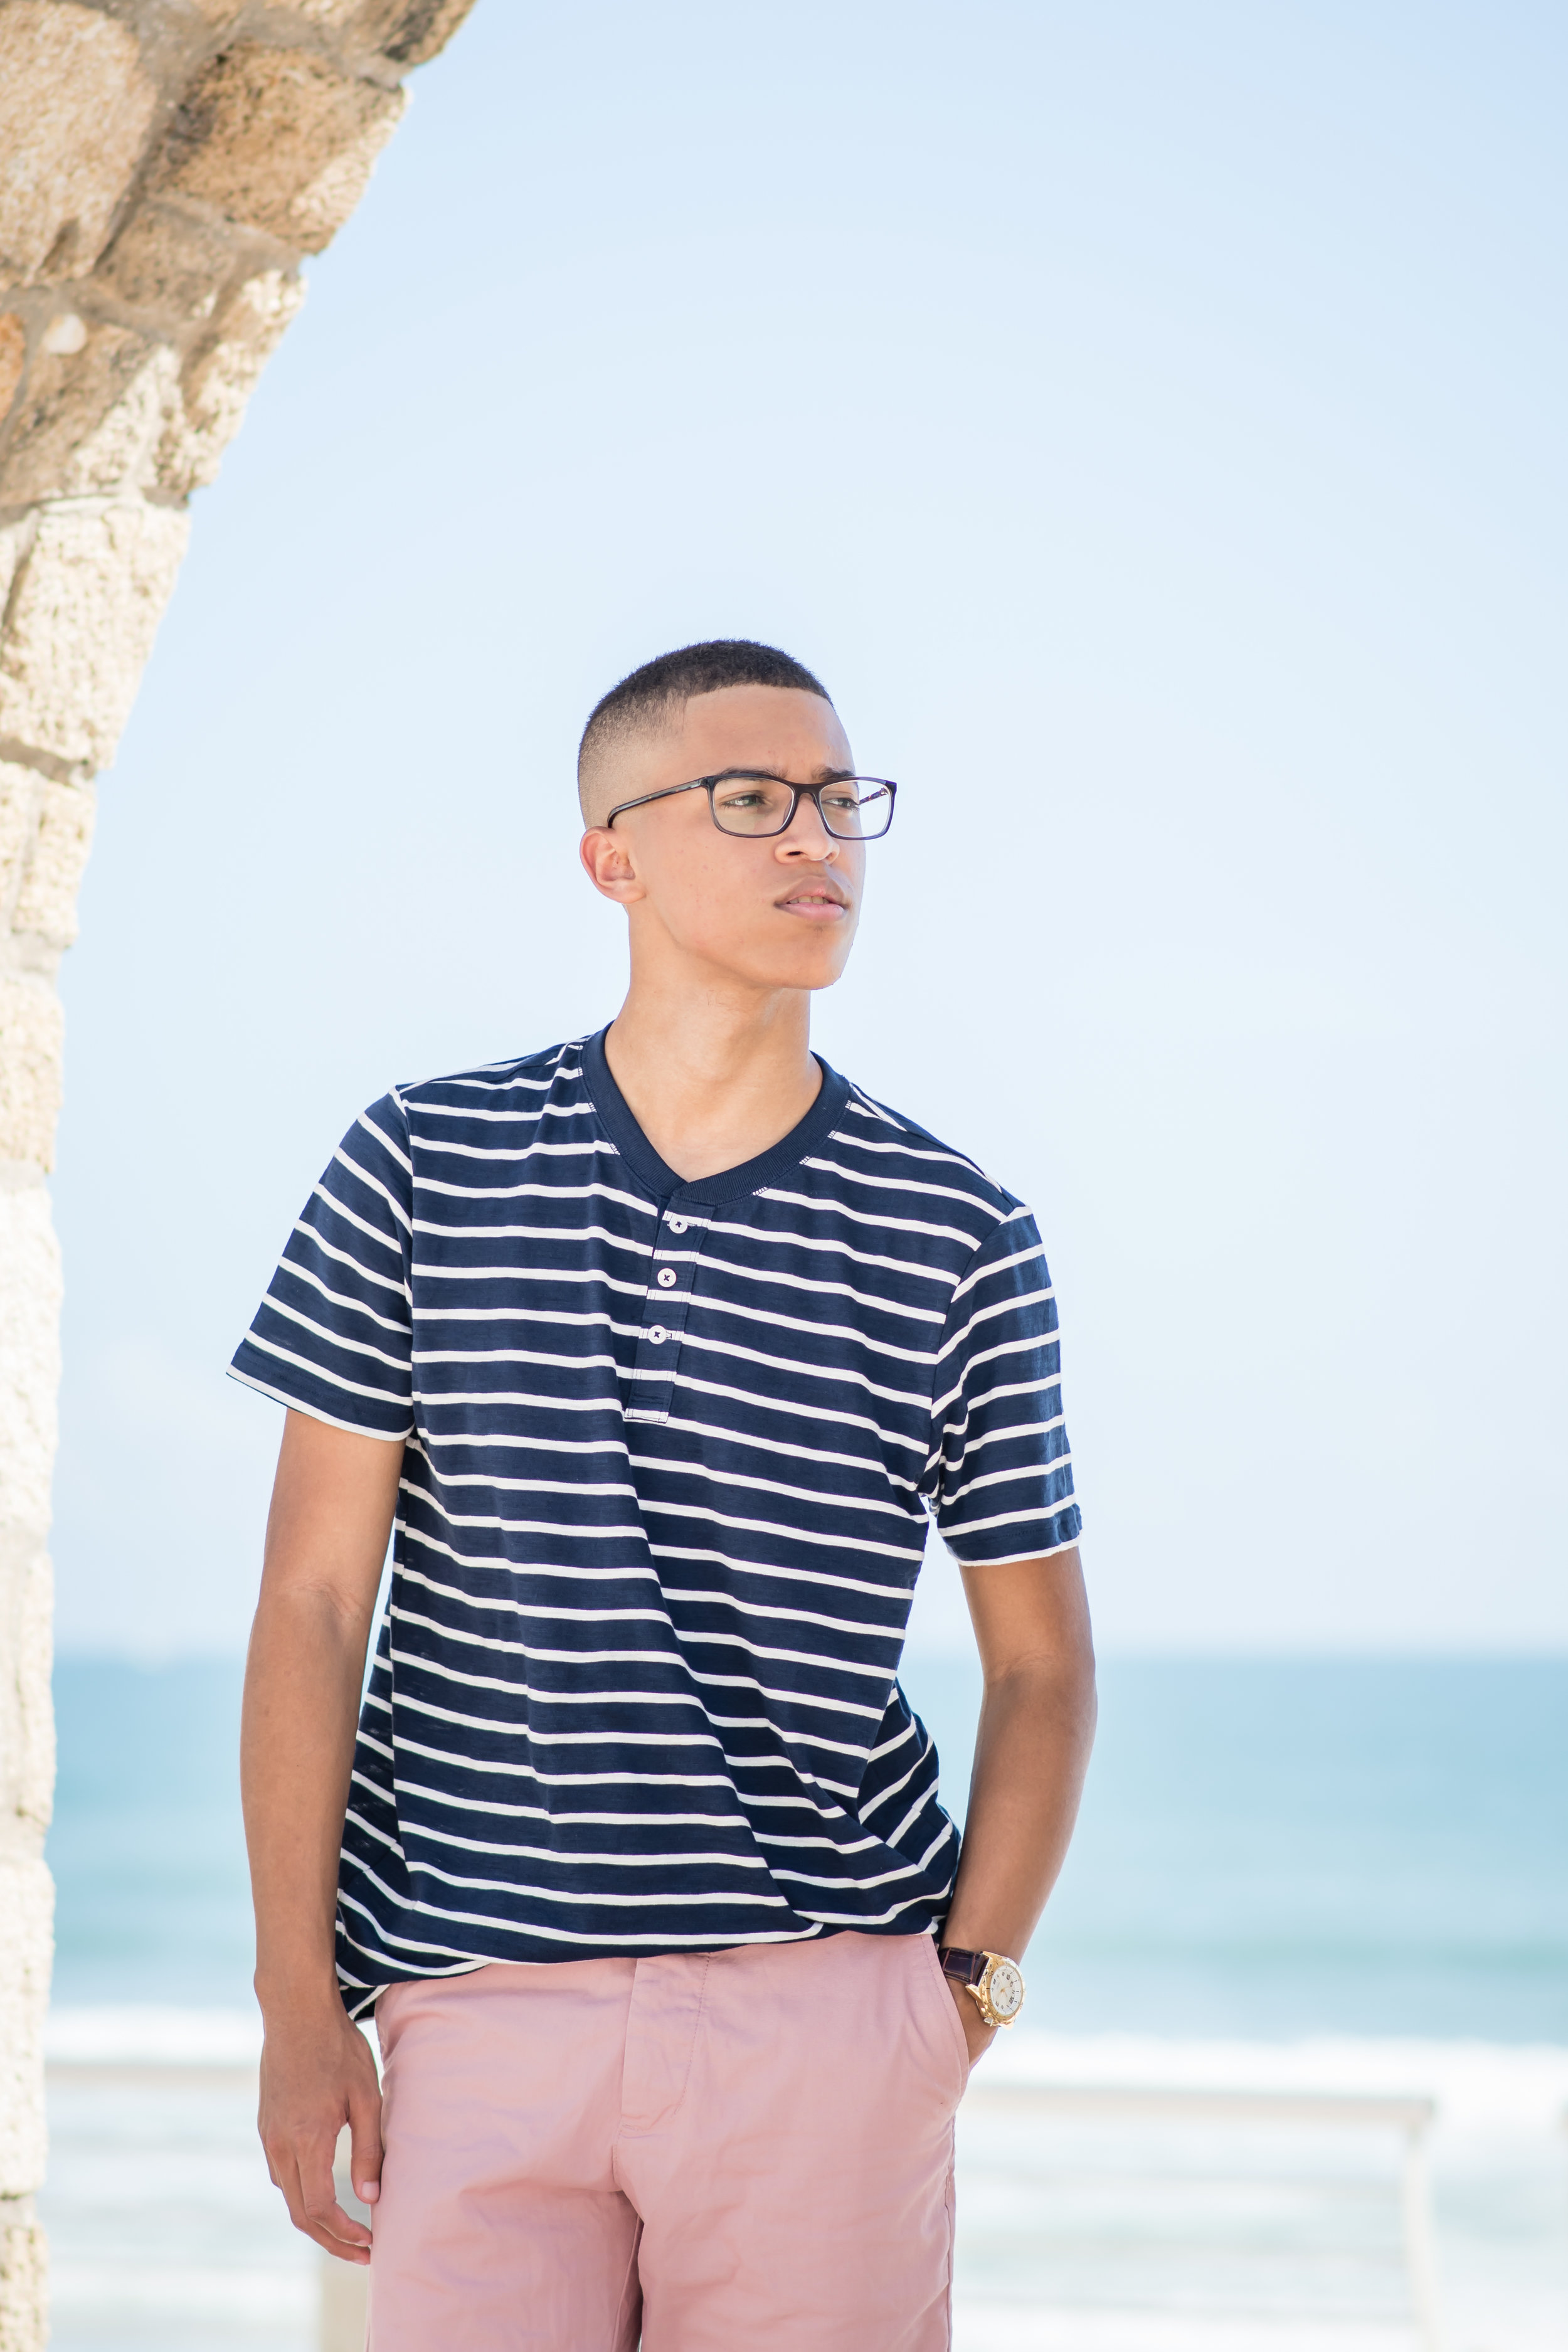 daytona-beach-men-fashion-photos-orlando-photographer-yanitza-ninett-30.jpg